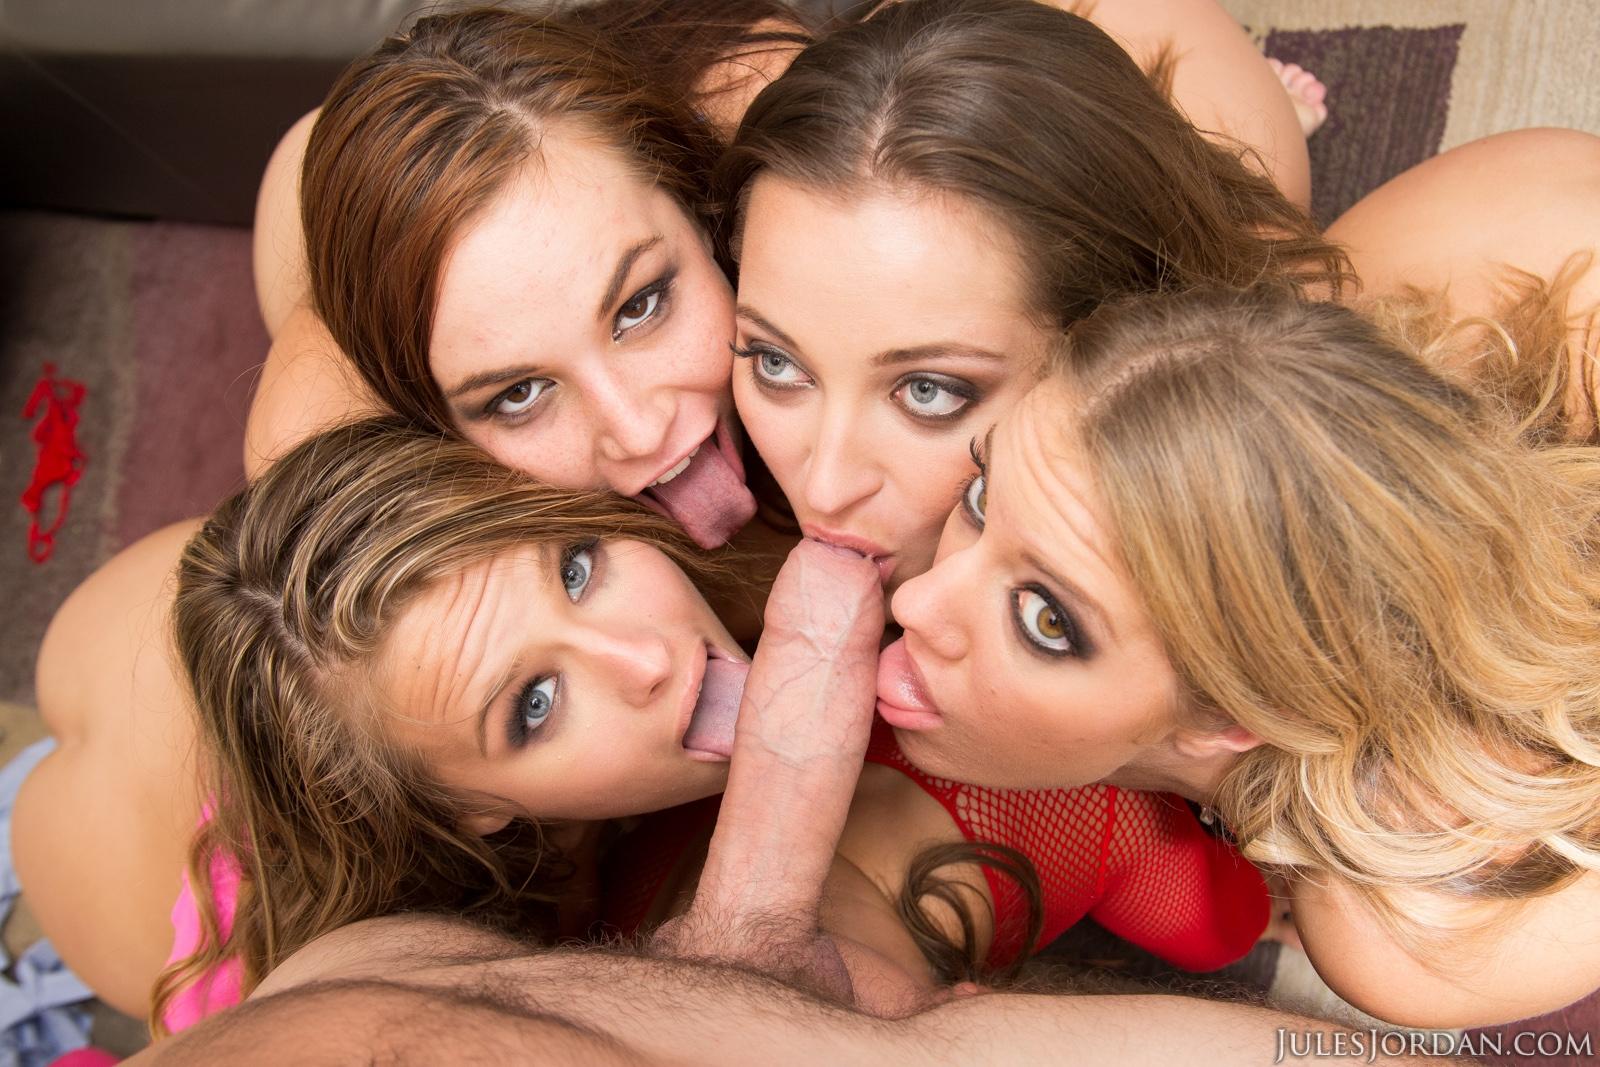 Orgia - 5 chicas lindas comparten una verga grande